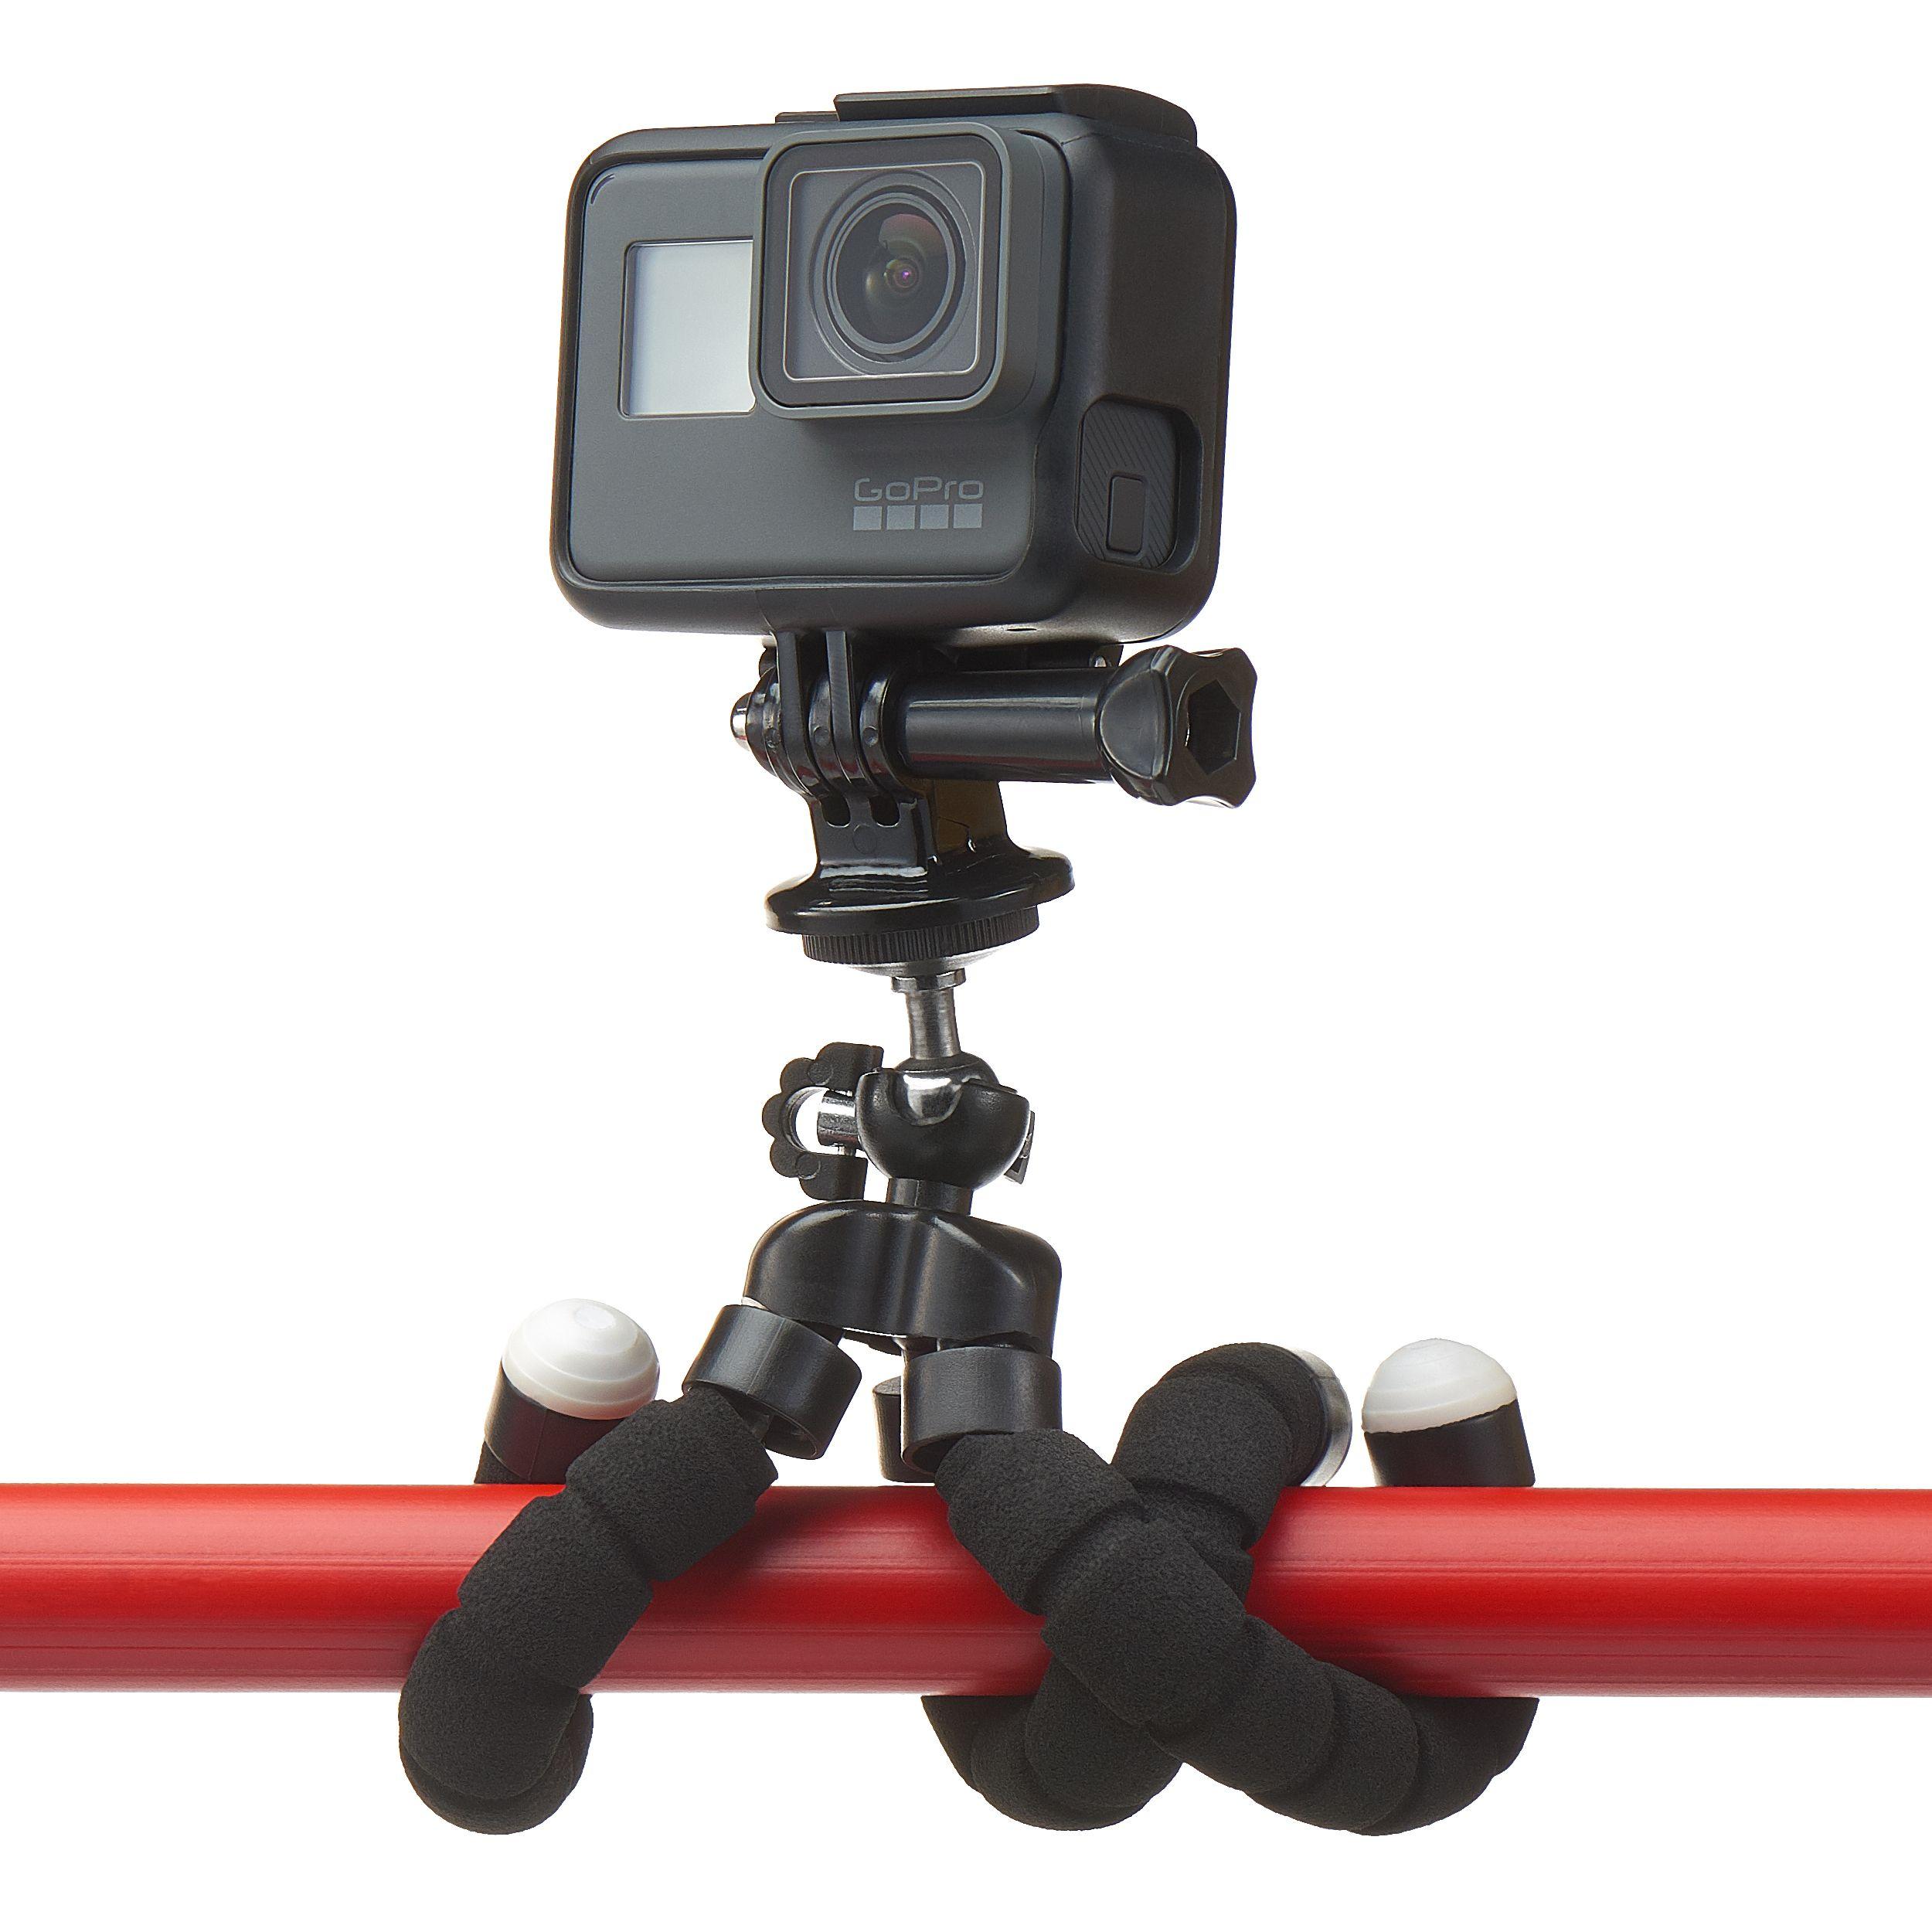 Mini Cell Phone Tripod AnyMore Flexible Tripod with